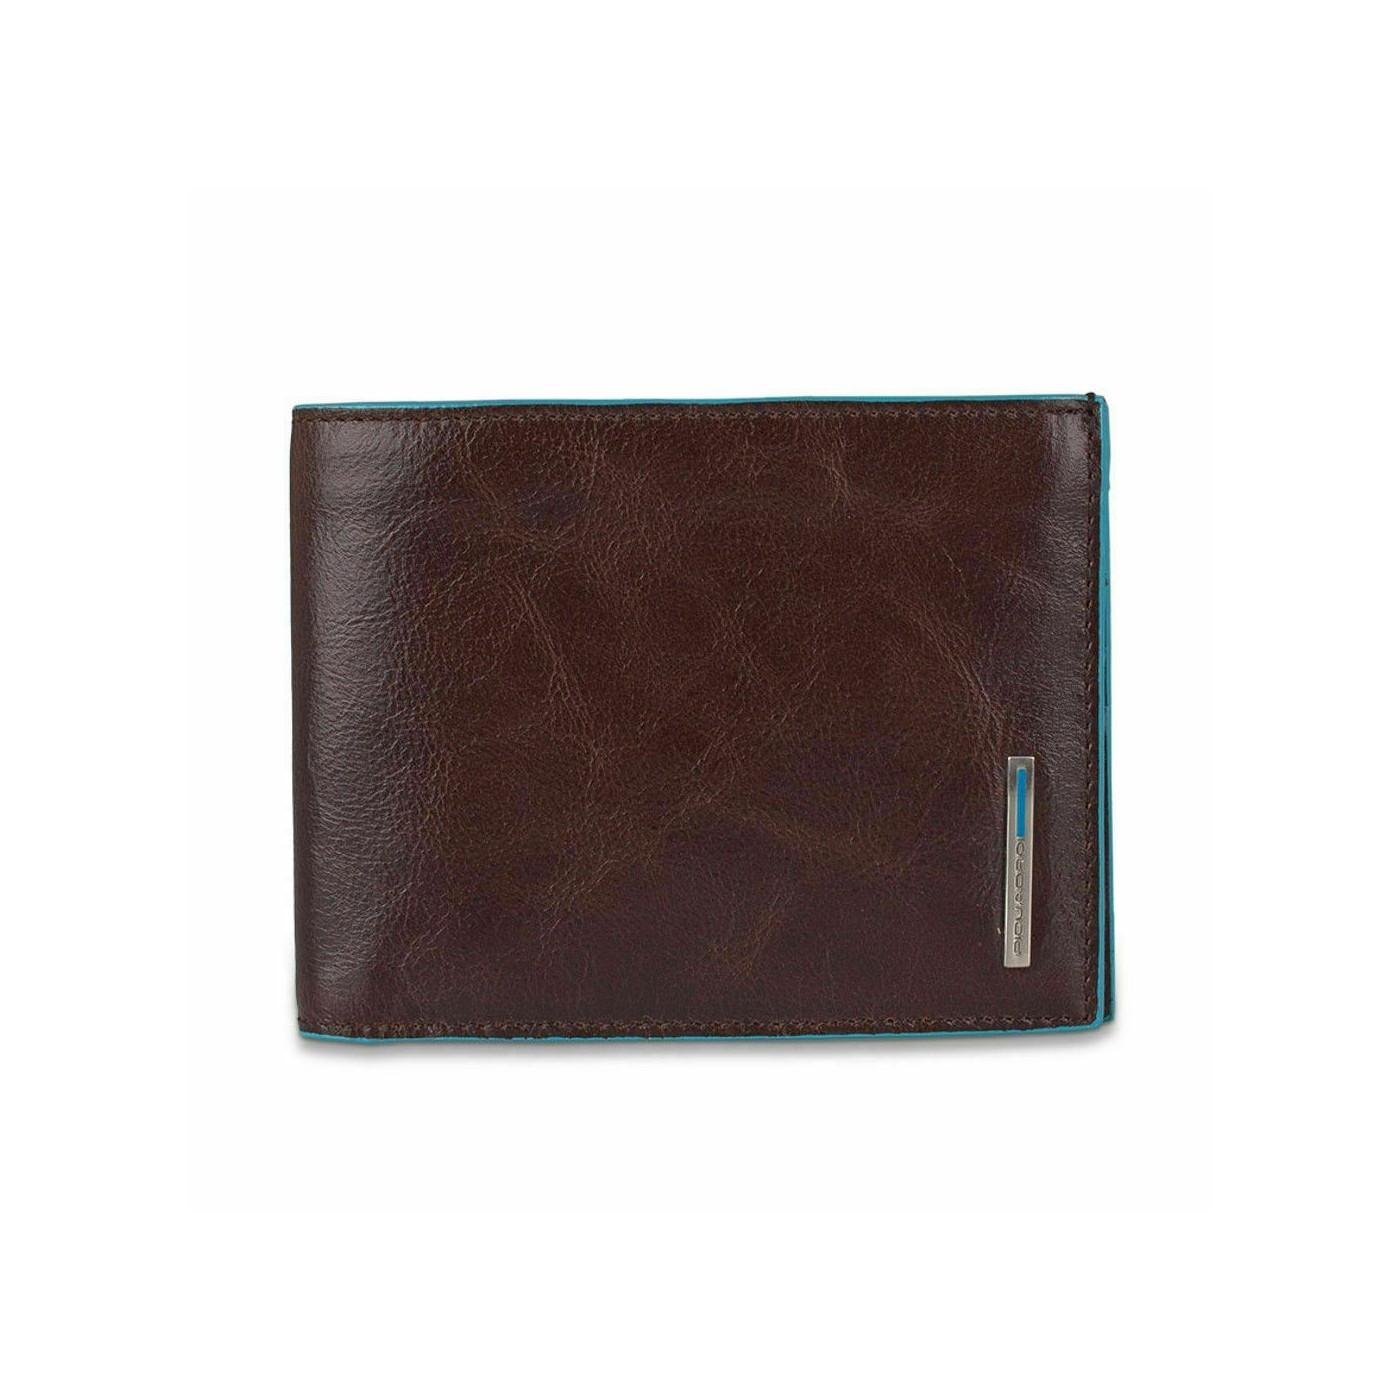 PIQUADRO Blue Square portafogli uomo 14 cc, RFID, pelle mogano